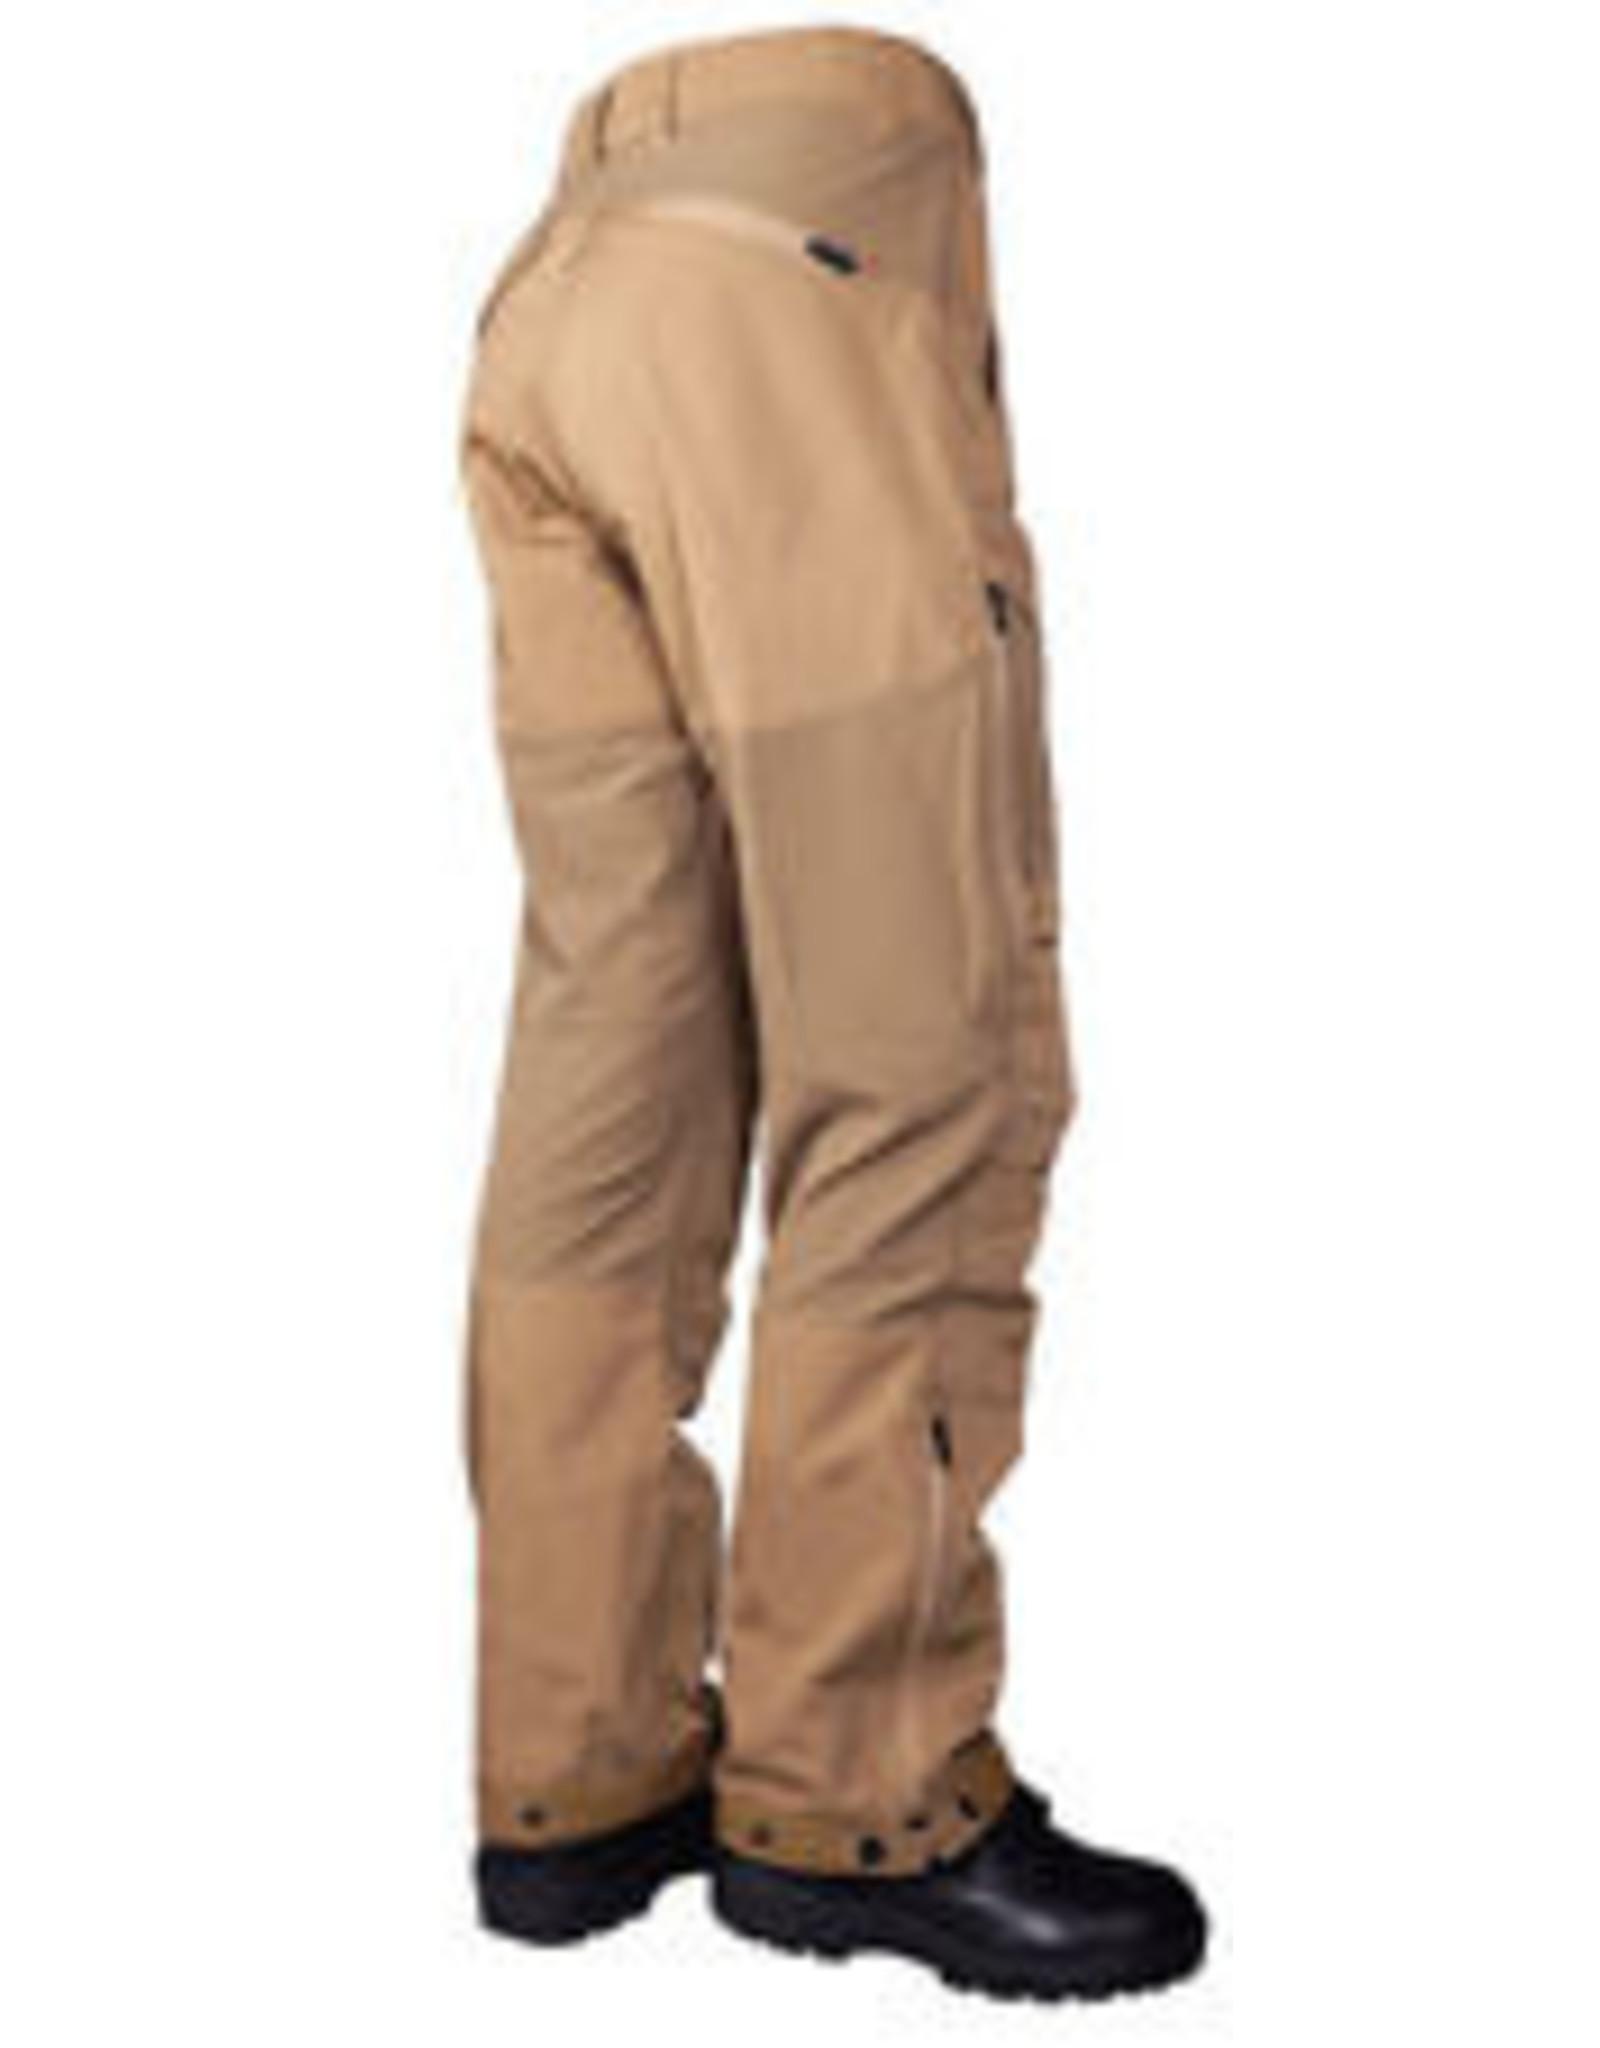 TRU-SPEC TRU-SPEC 24-7 XPEDITION Pant